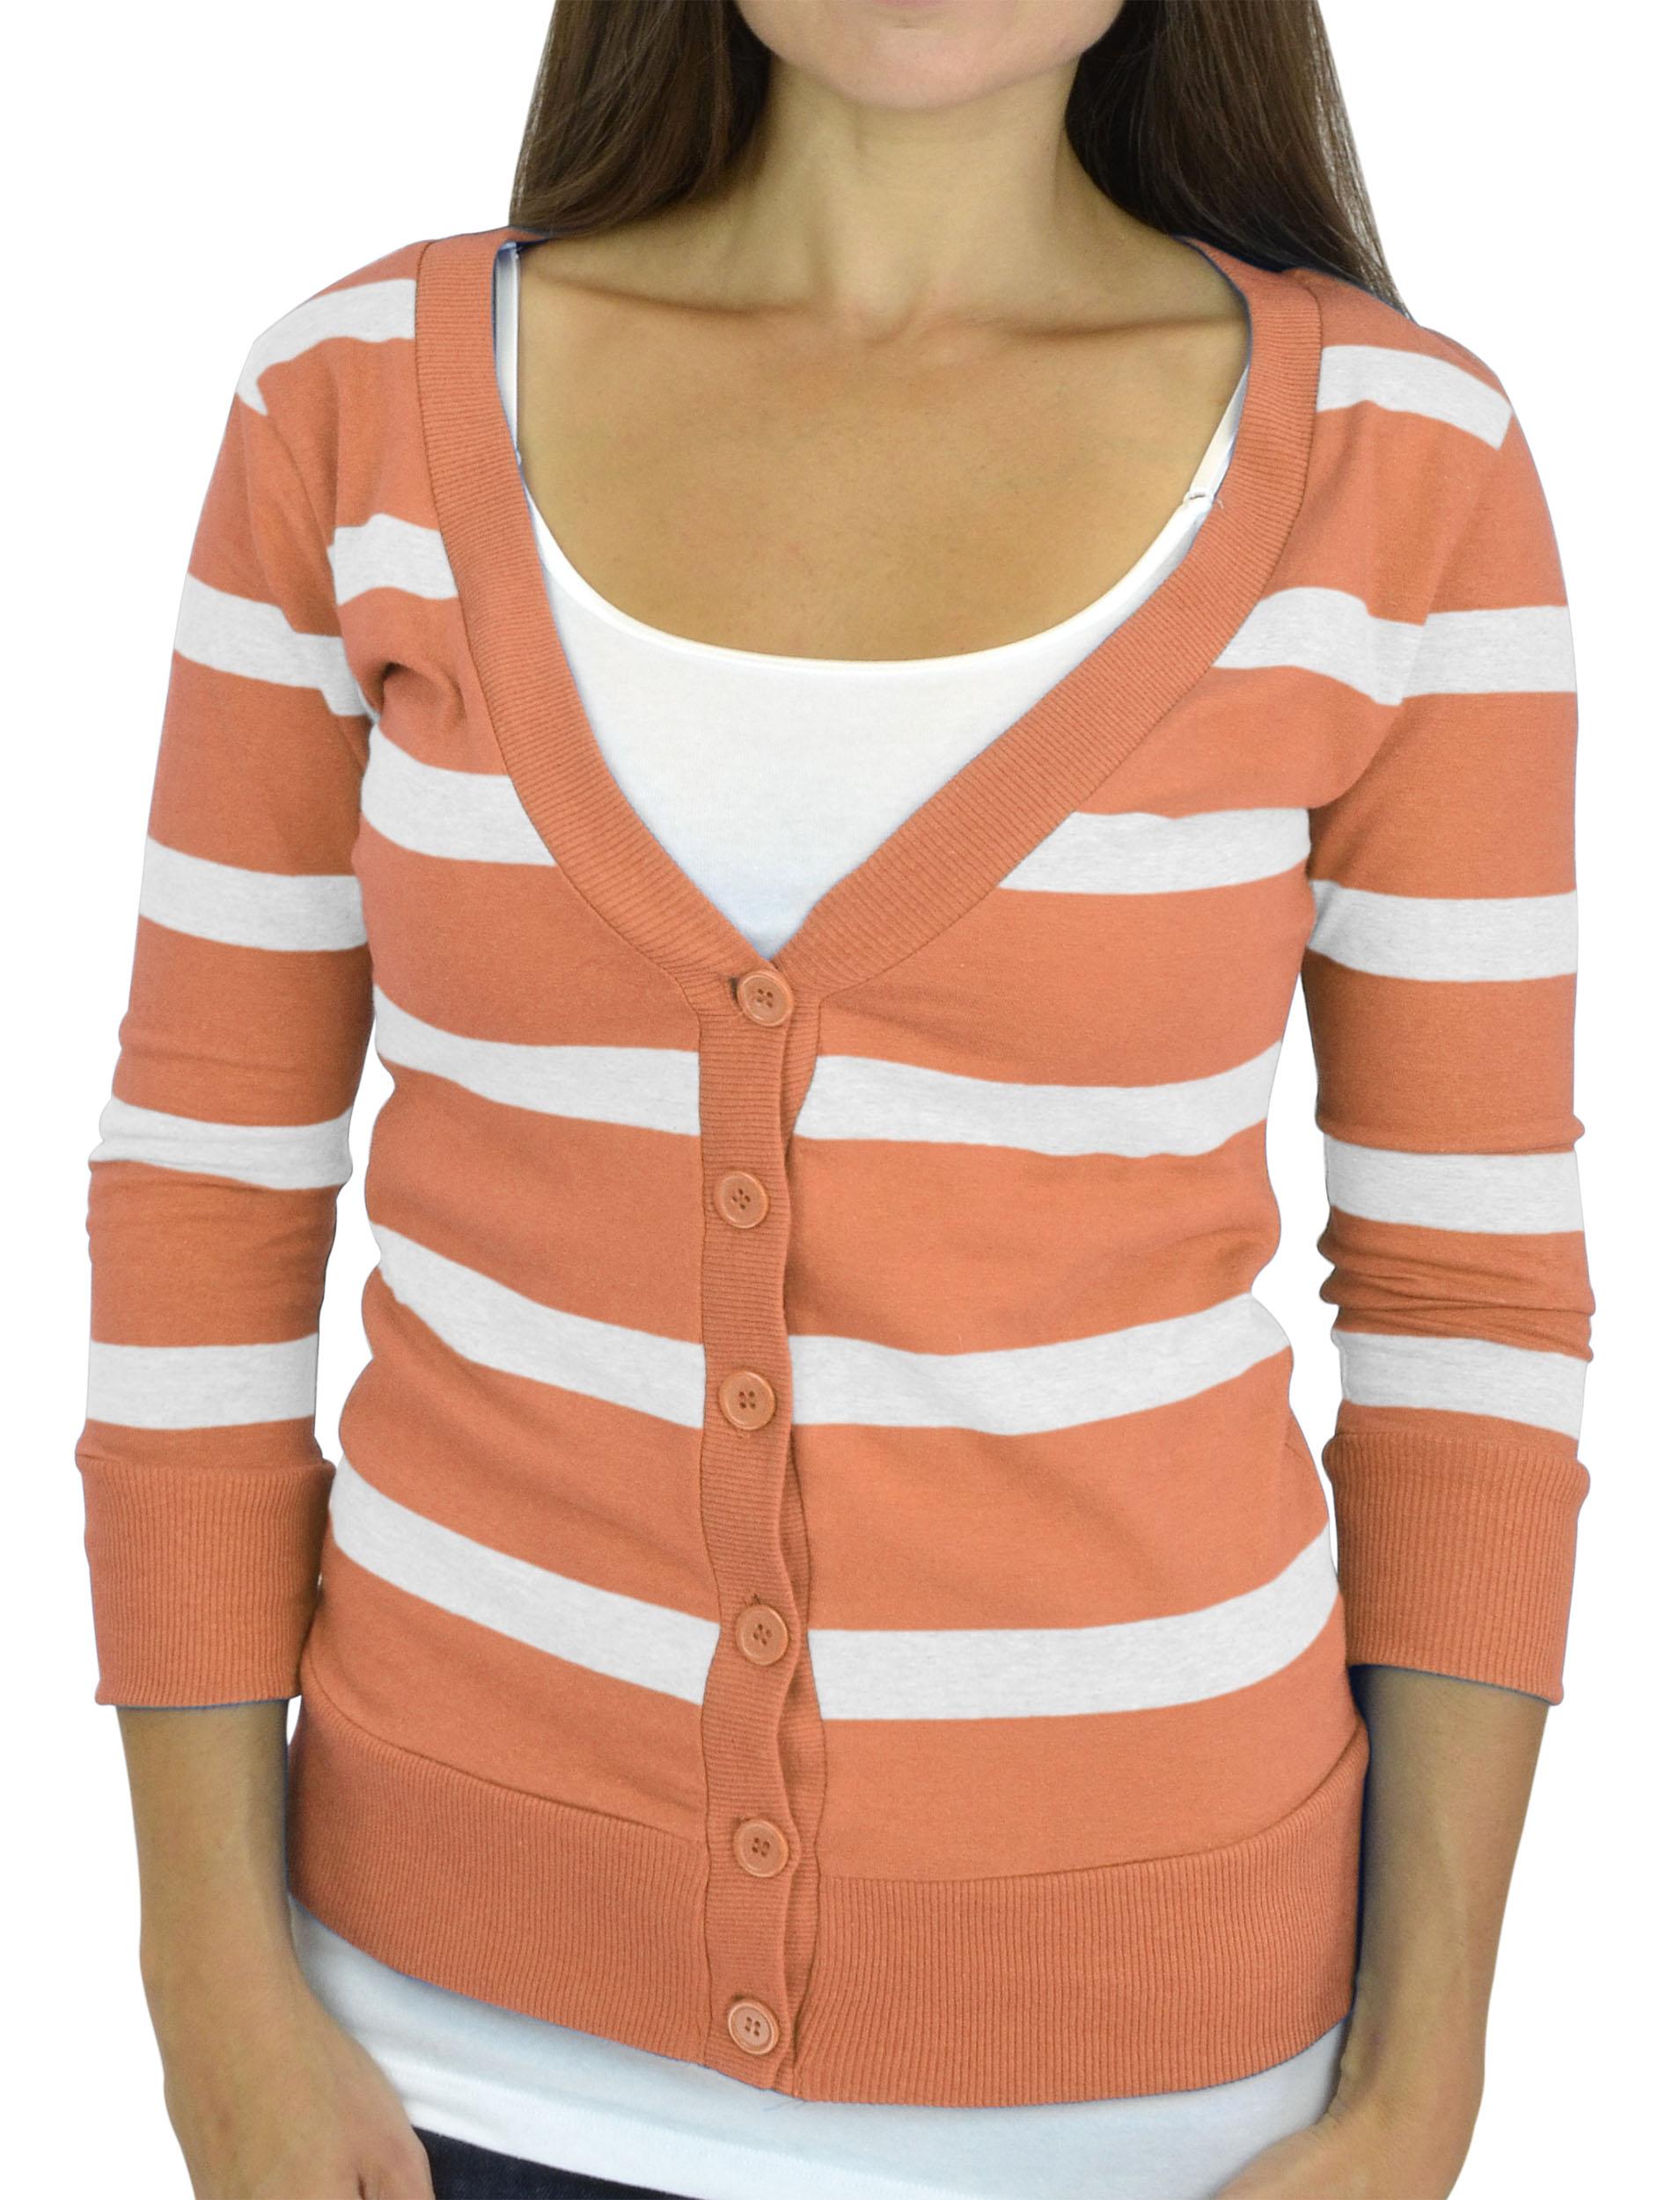 Belle Donne - Women / Girl Junior Size Soft 3/4 Sleeve V-Neck Sweater Cardigans - Peach/Large